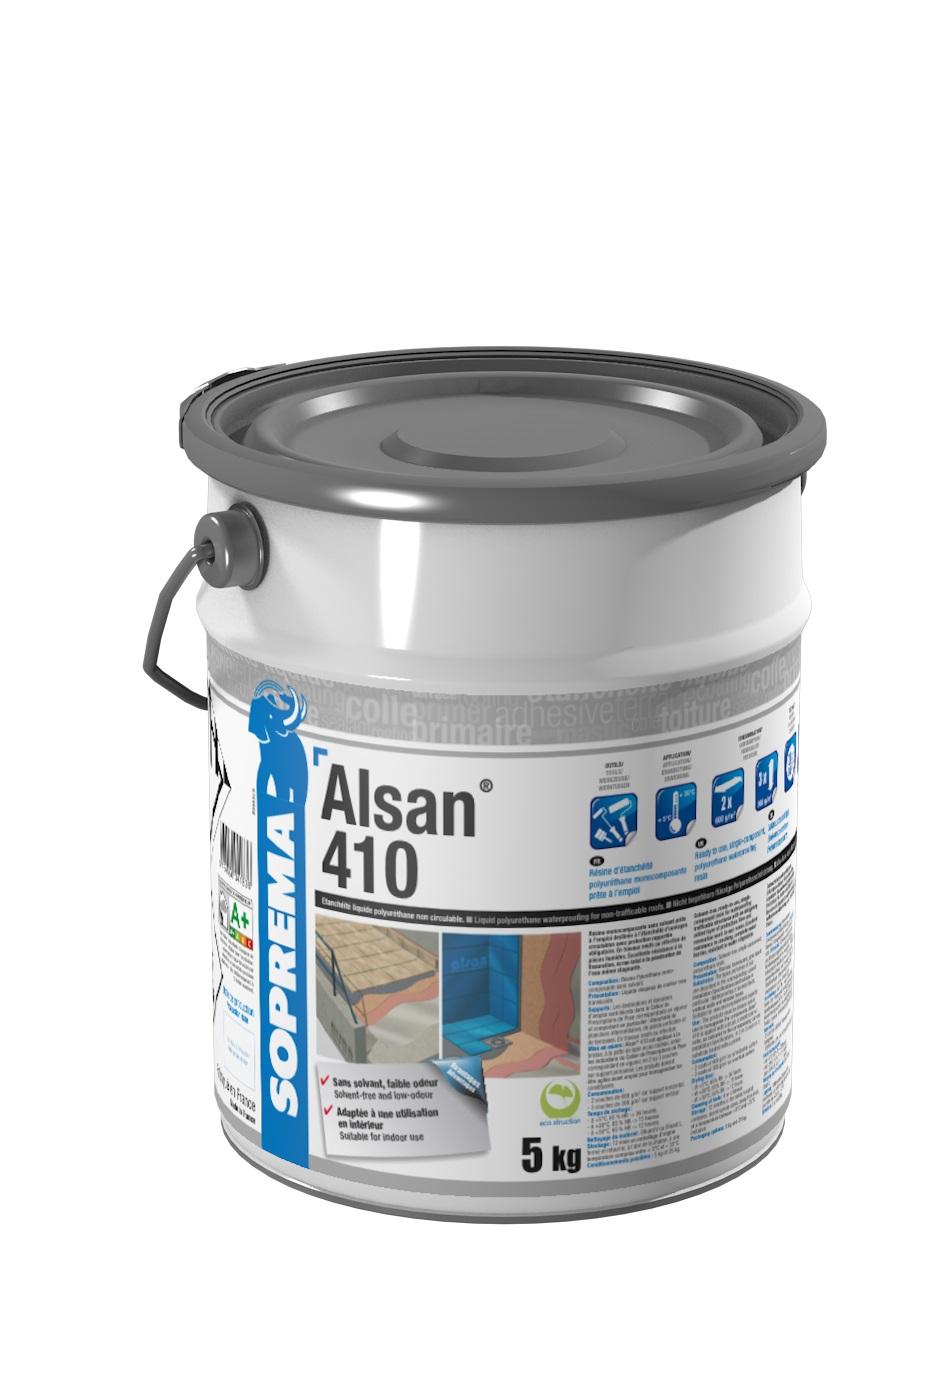 ALSAN 410